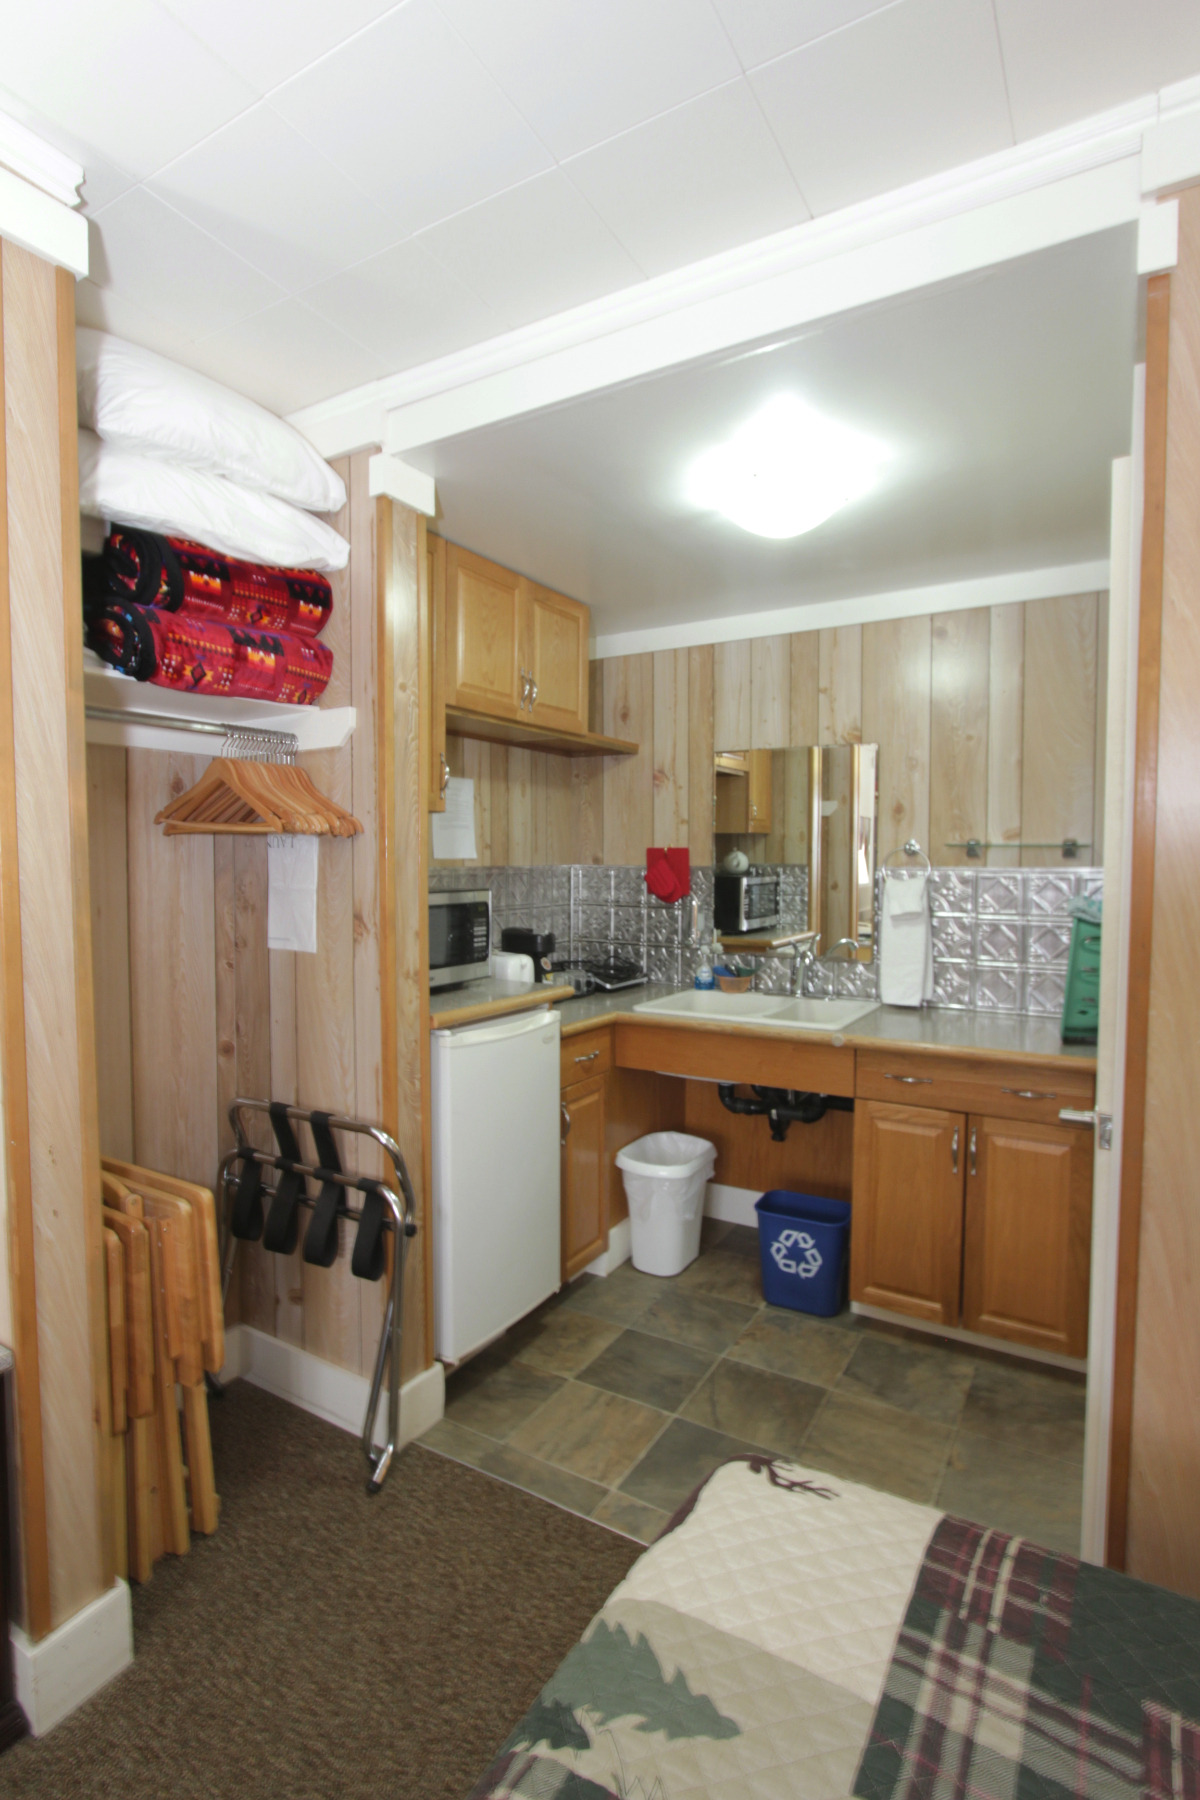 Room 11 kitchenette